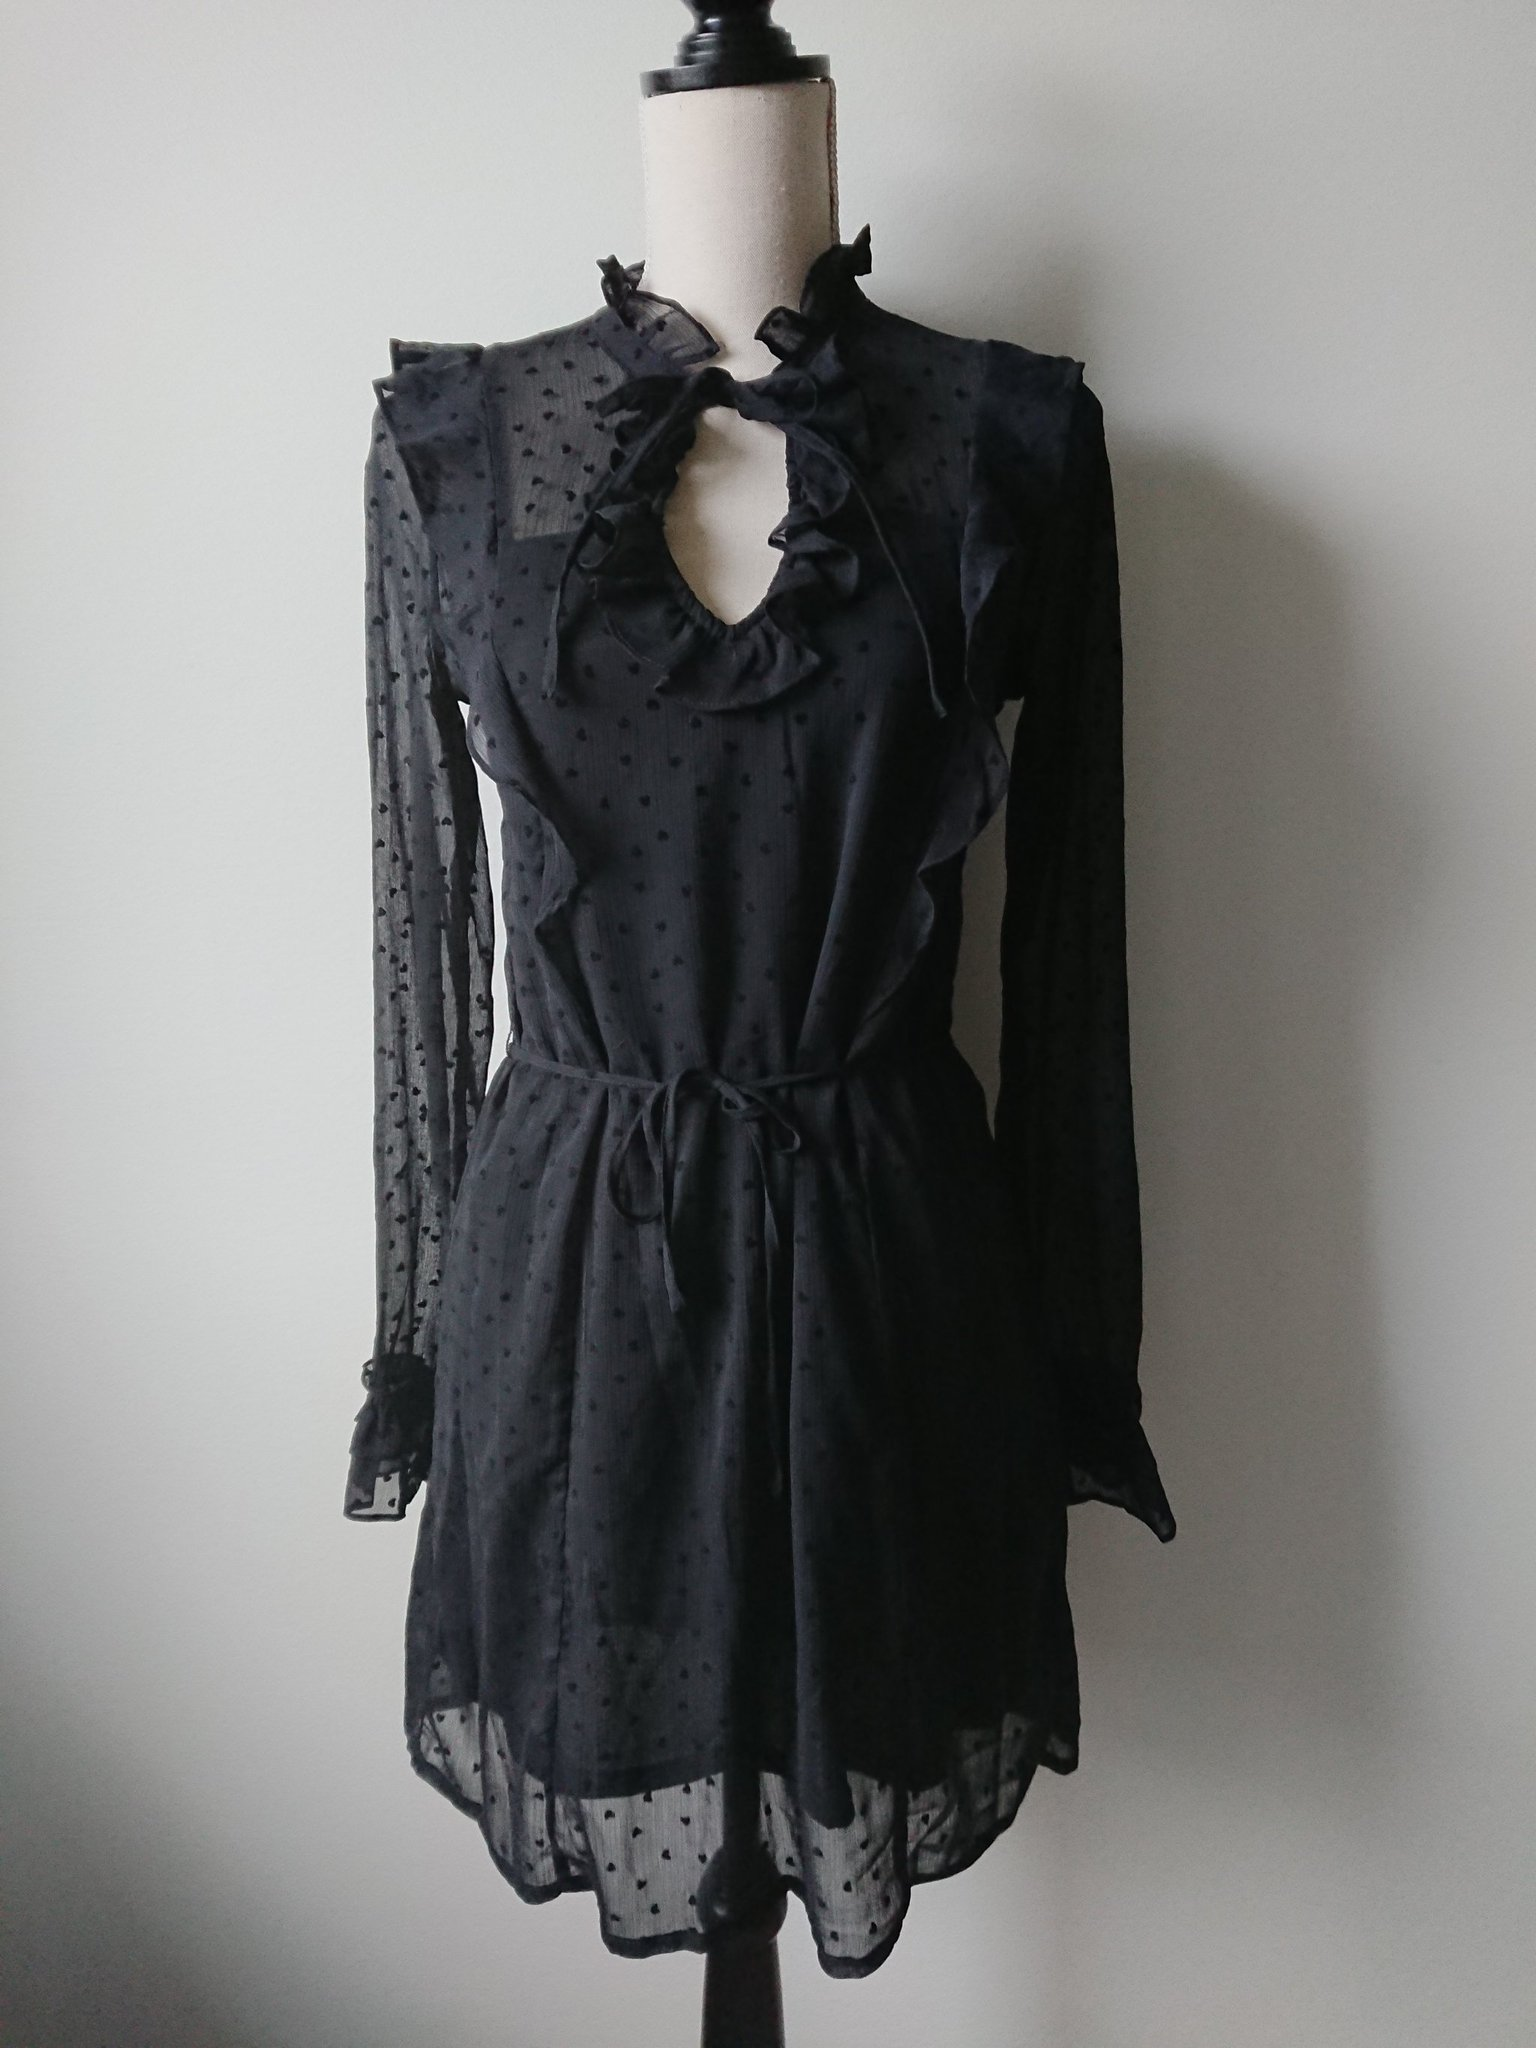 Svart klänning, H&M, hjärtan, chiffong, romanti.. (354141646